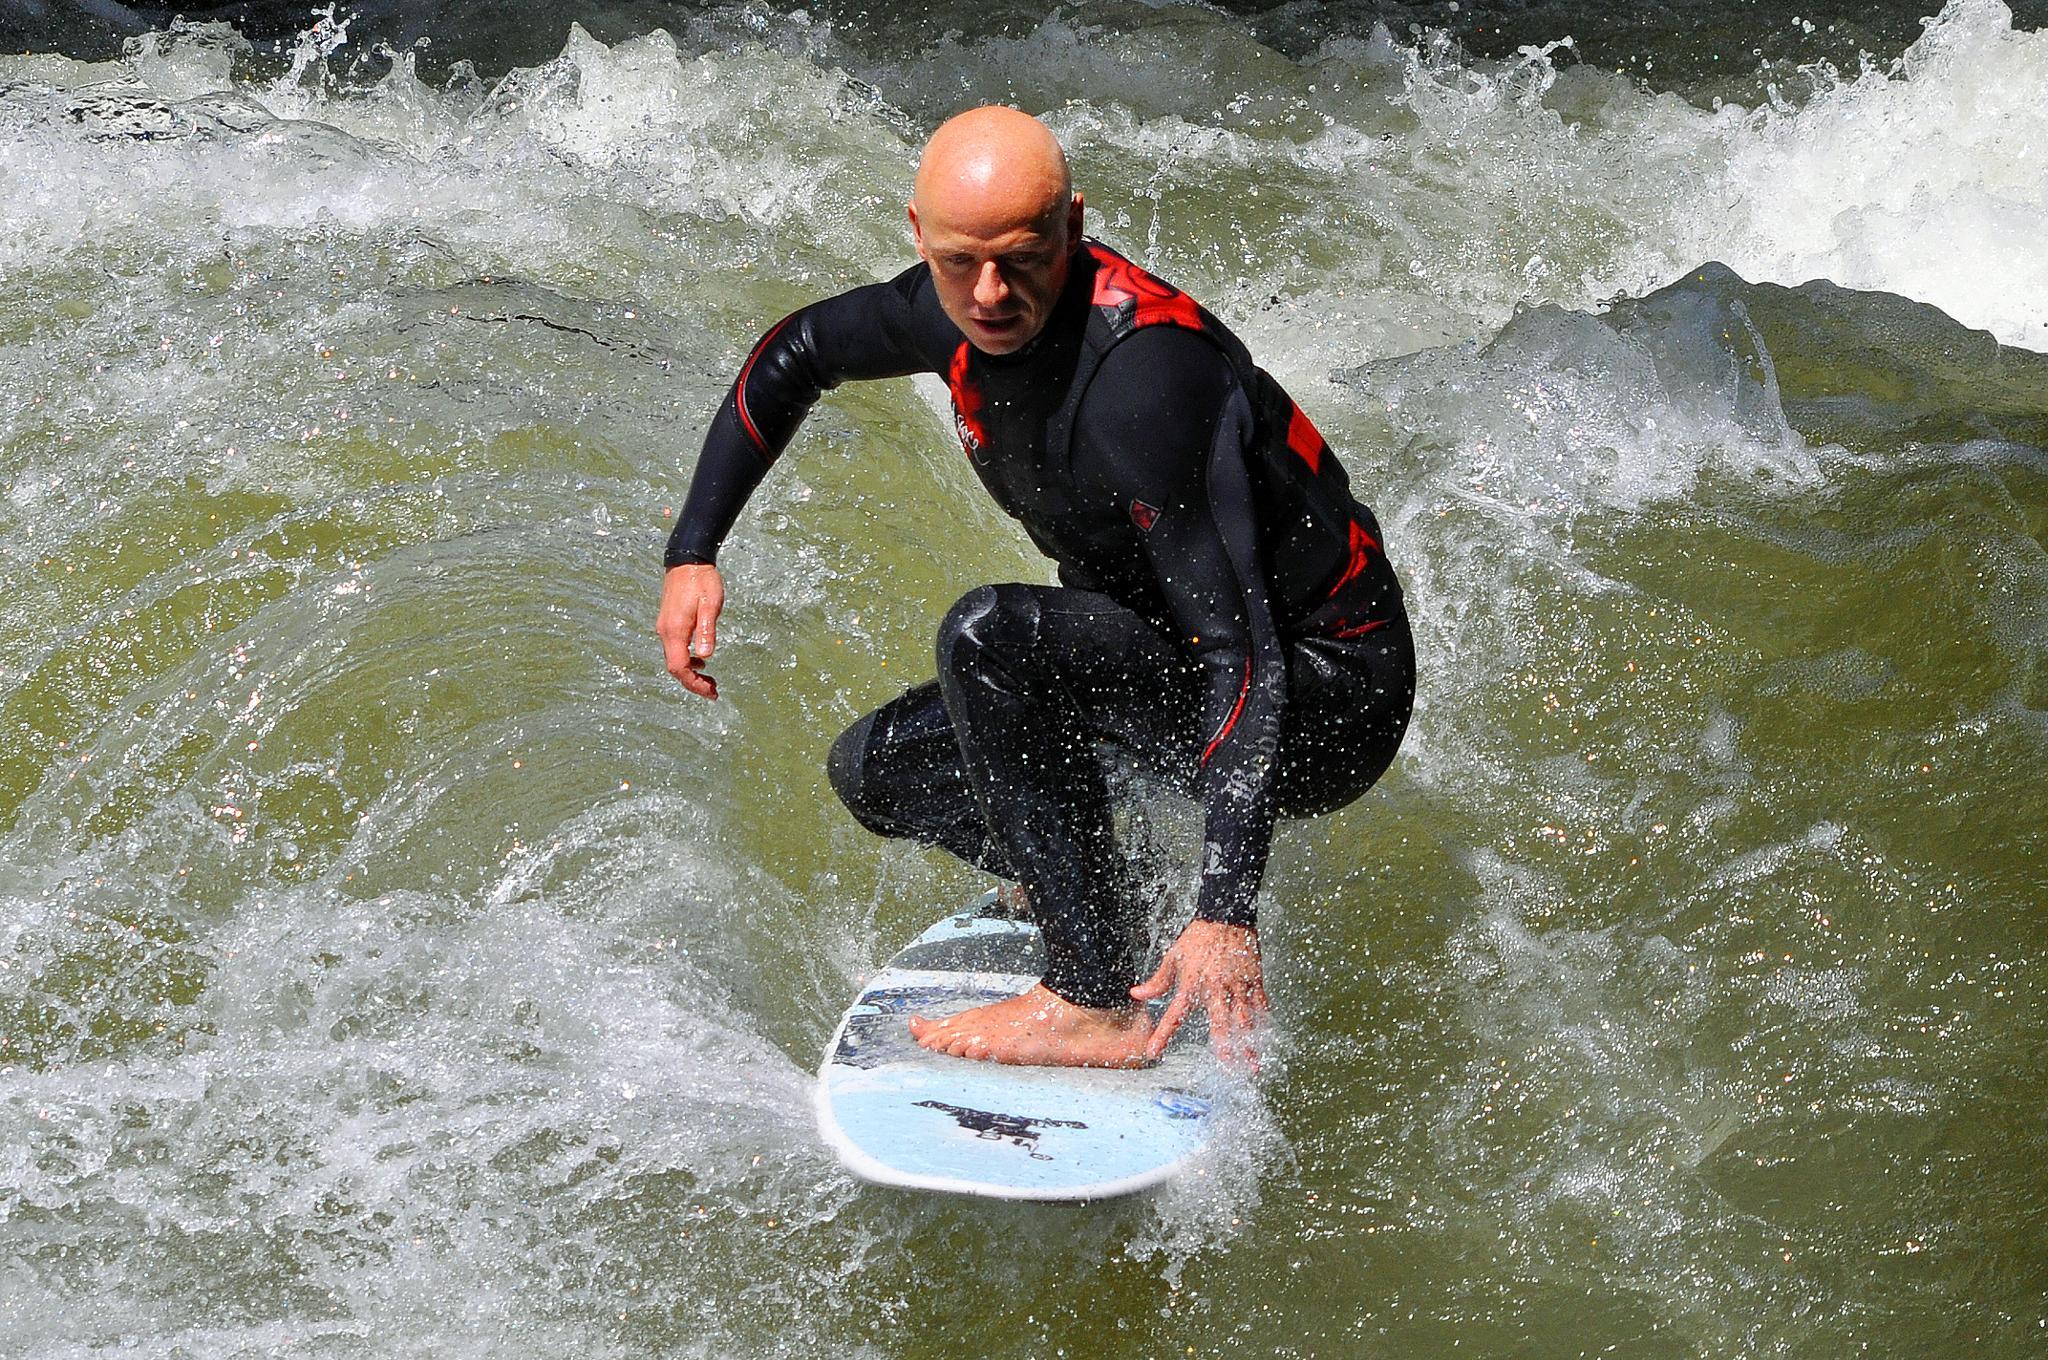 Ride Trhrough Wild Water by Marco Bertamé